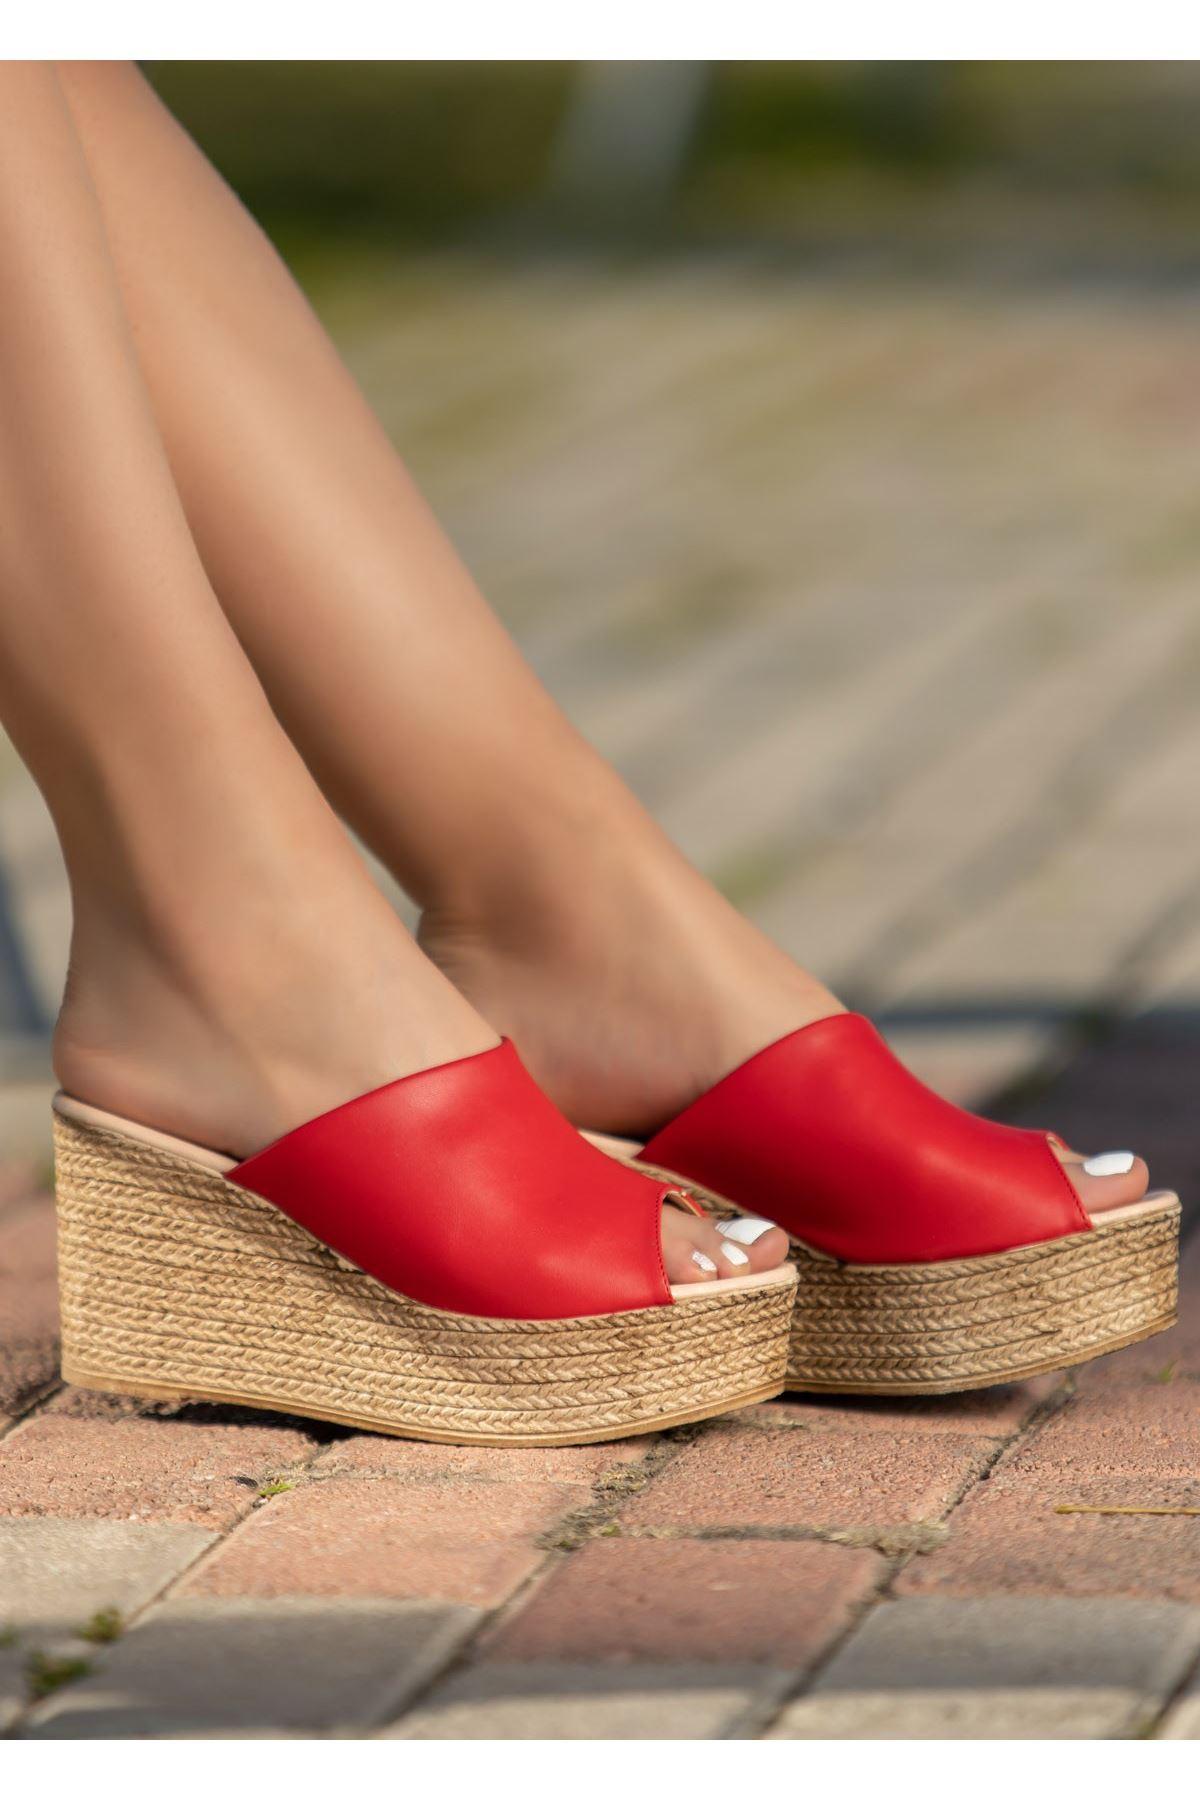 Hanna Kırmızı Cilt Dolgu Topuk Terlik